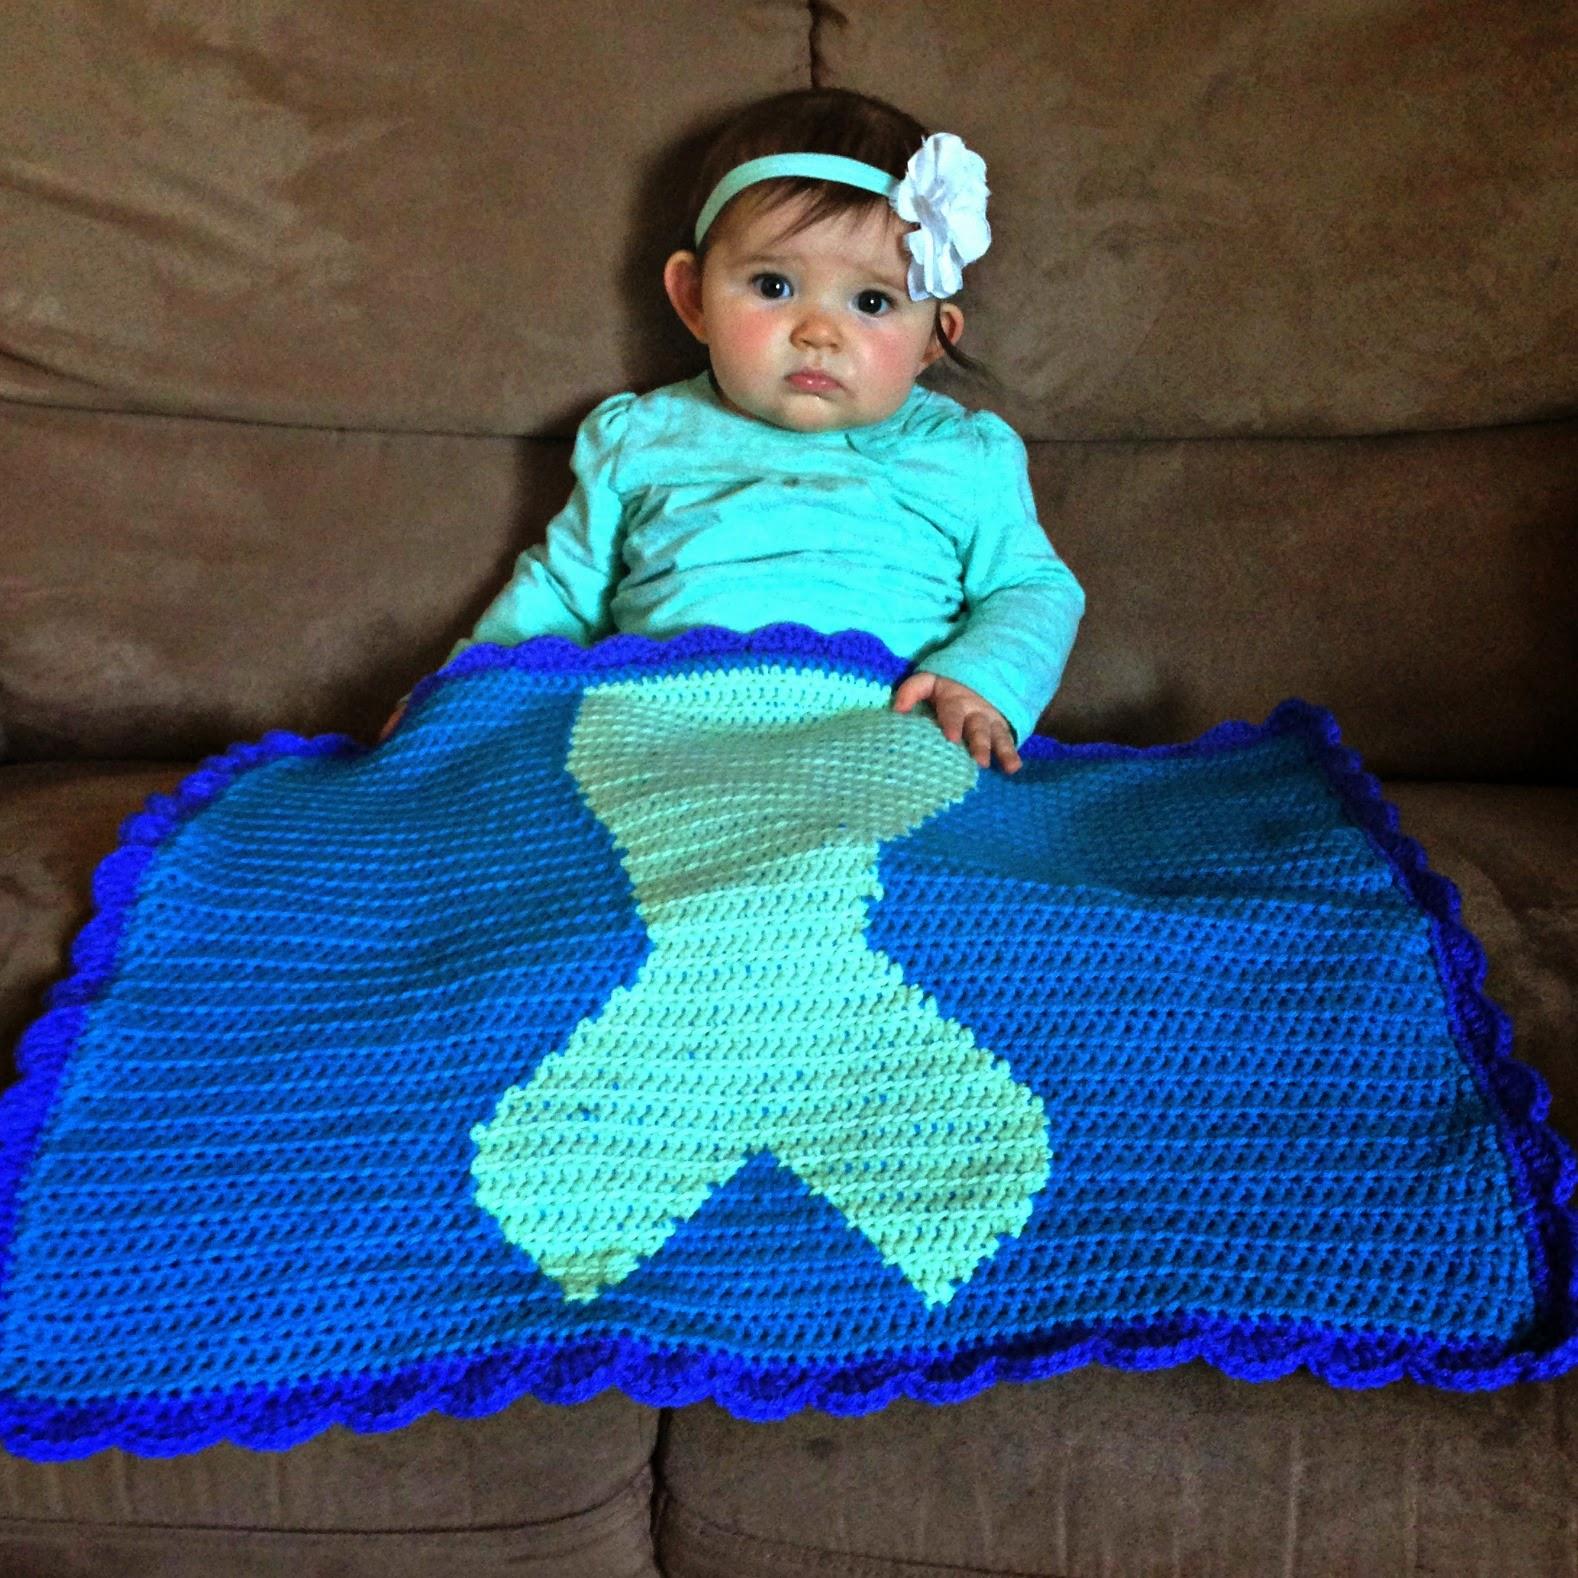 Free Crochet Mermaid Tail Blanket Pattern - The Friendly ...